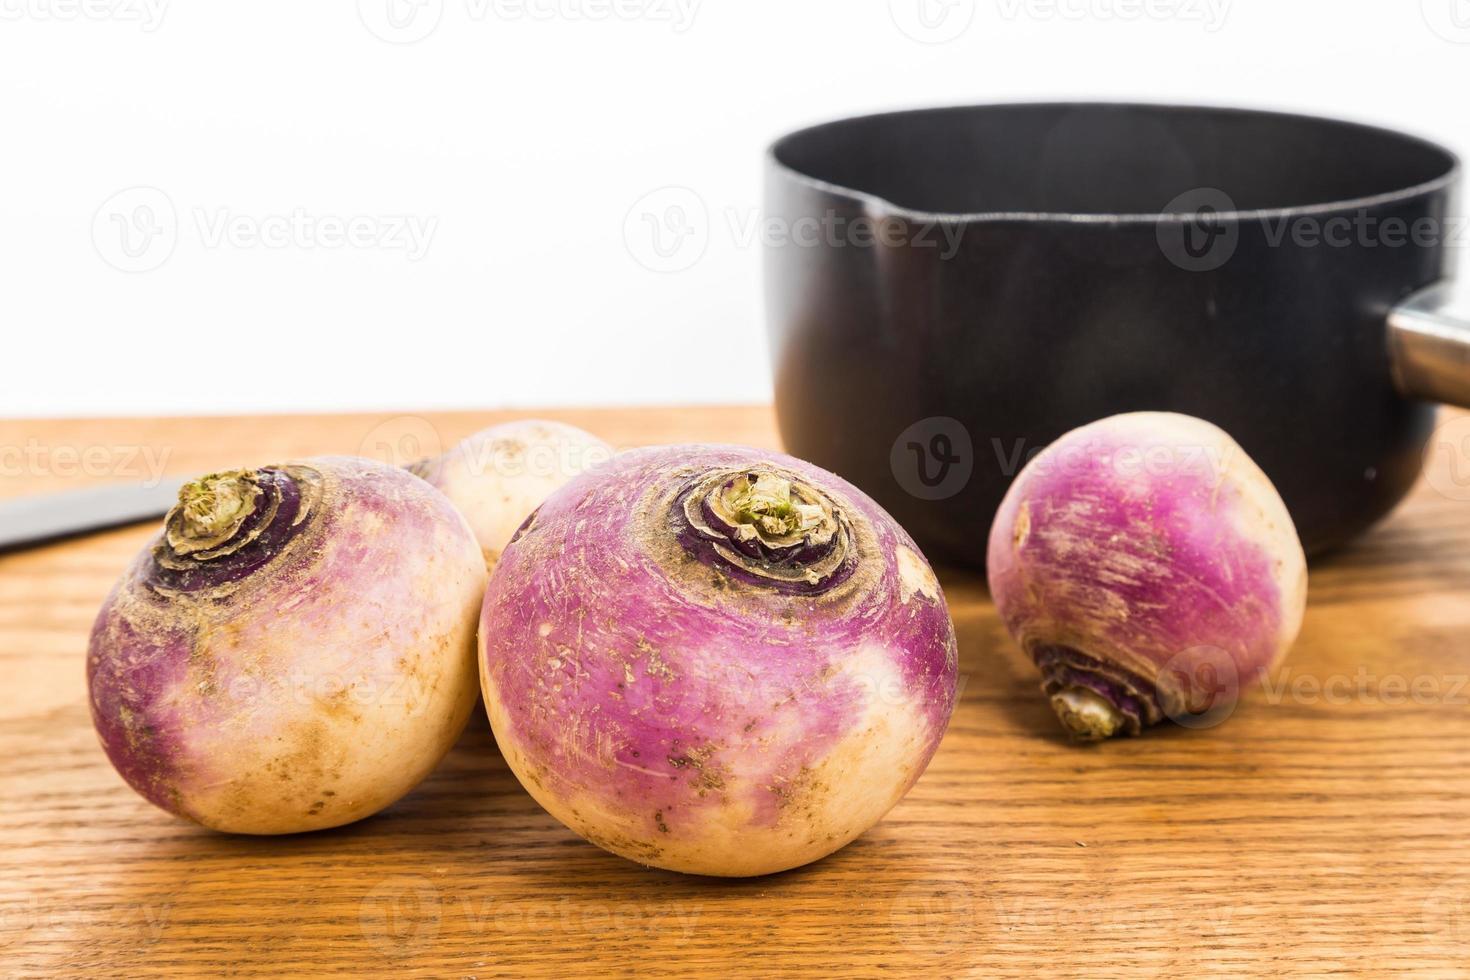 Raw Turnips and Sauce Pan photo